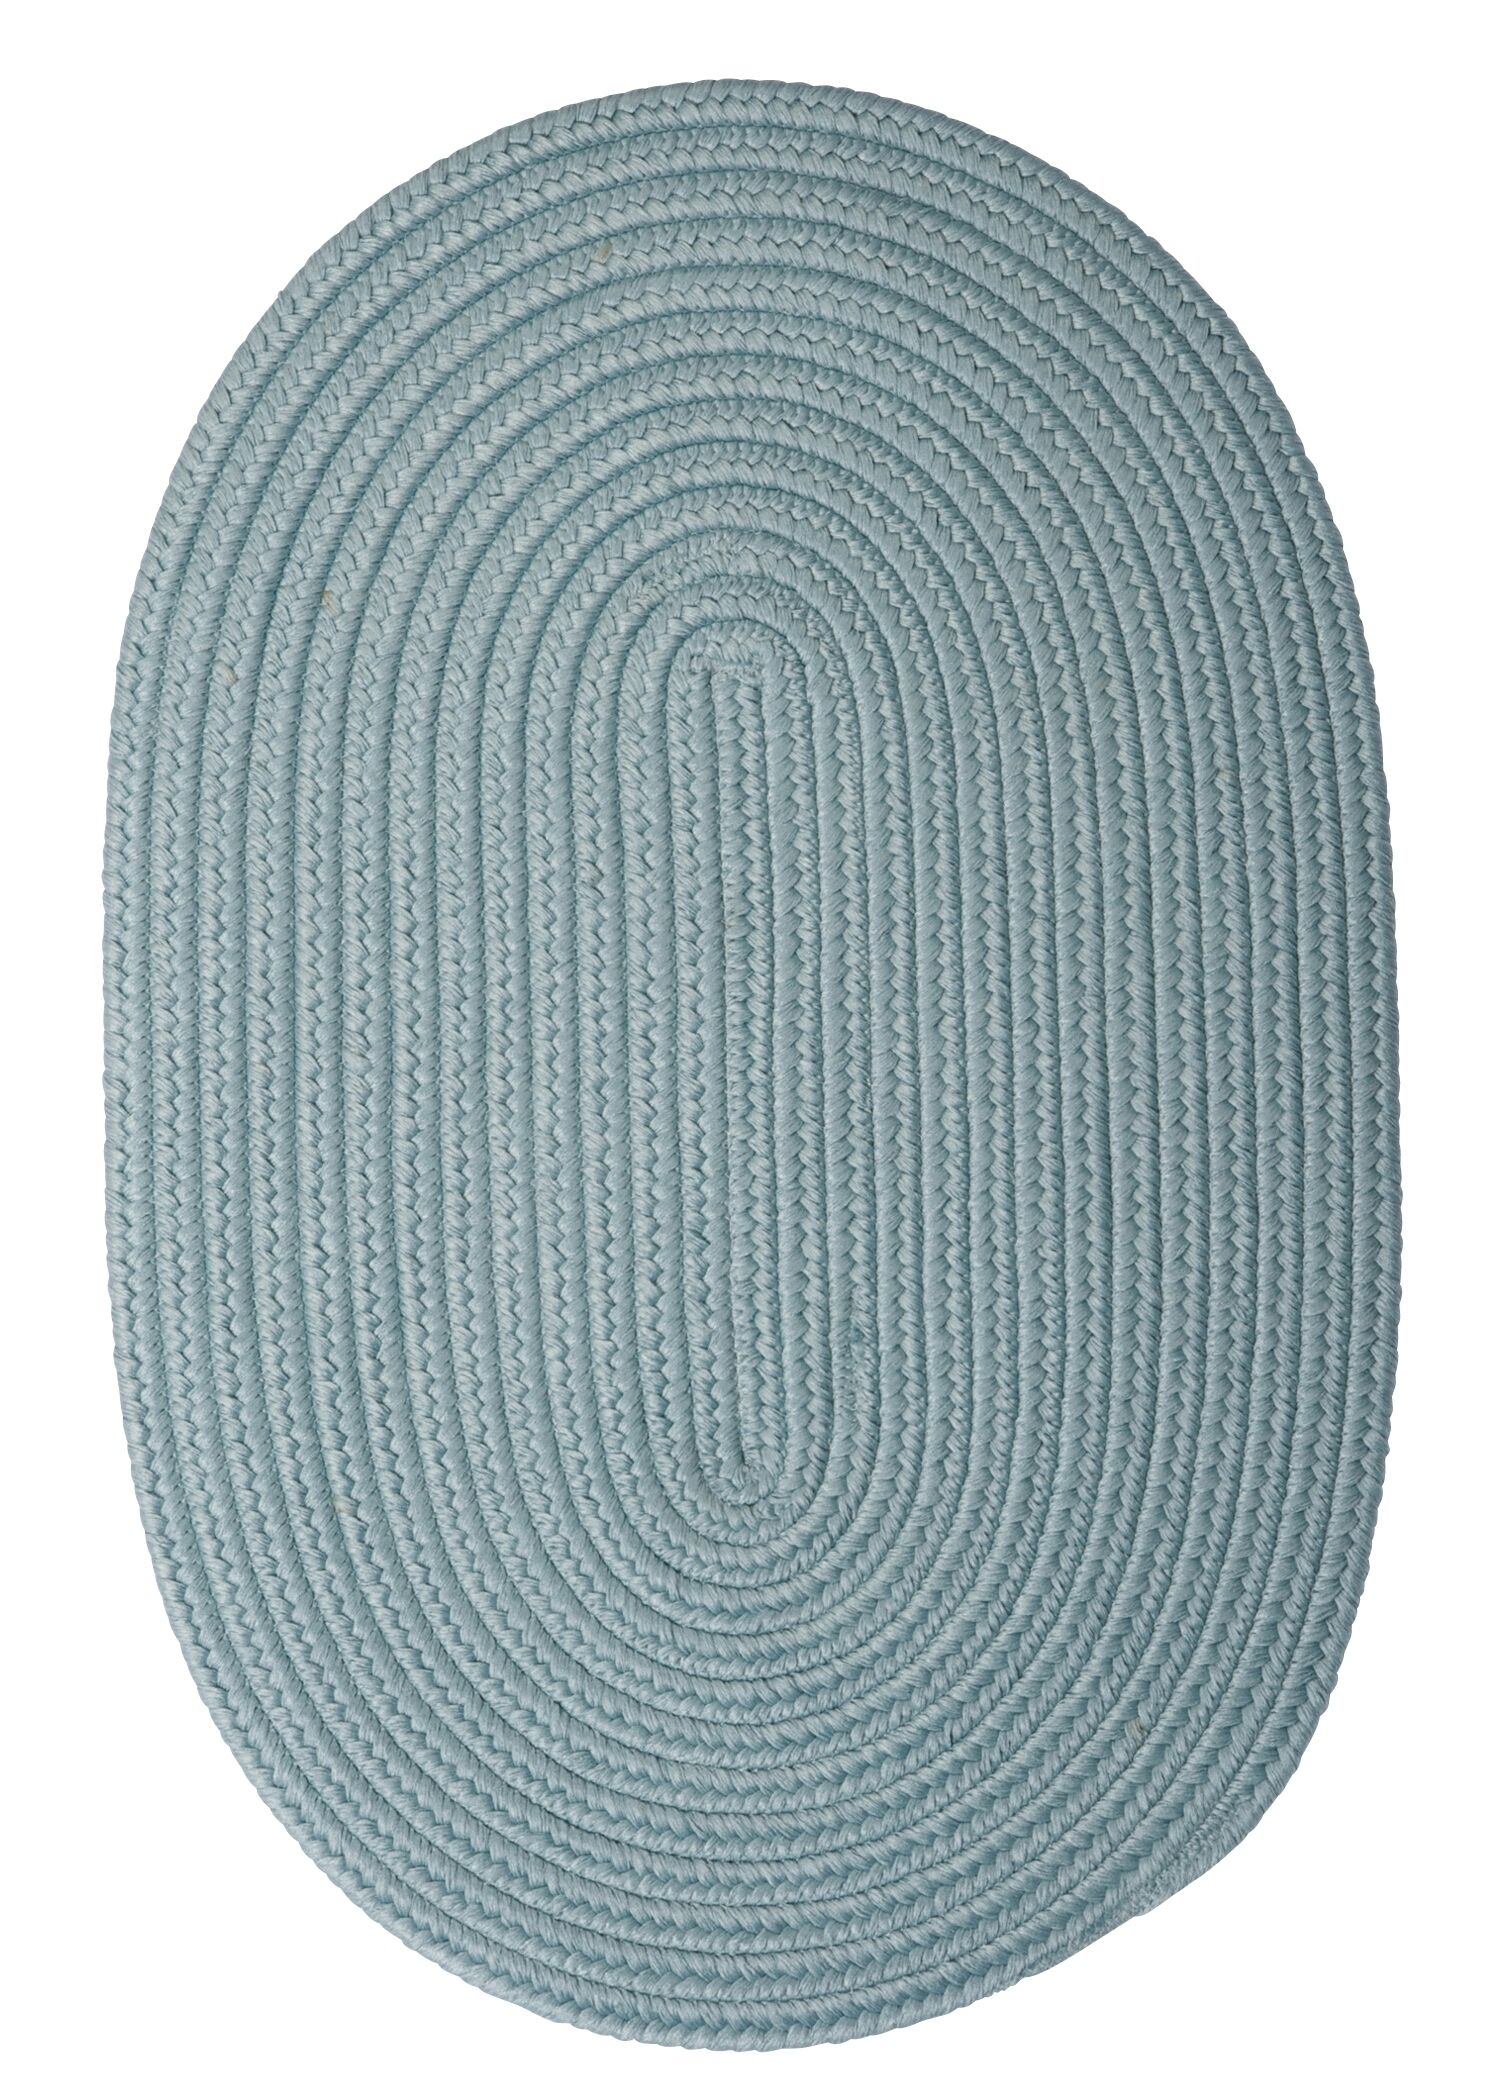 Mcintyre Blue Outdoor Area Rug Rug Size: Oval 7' x 9'